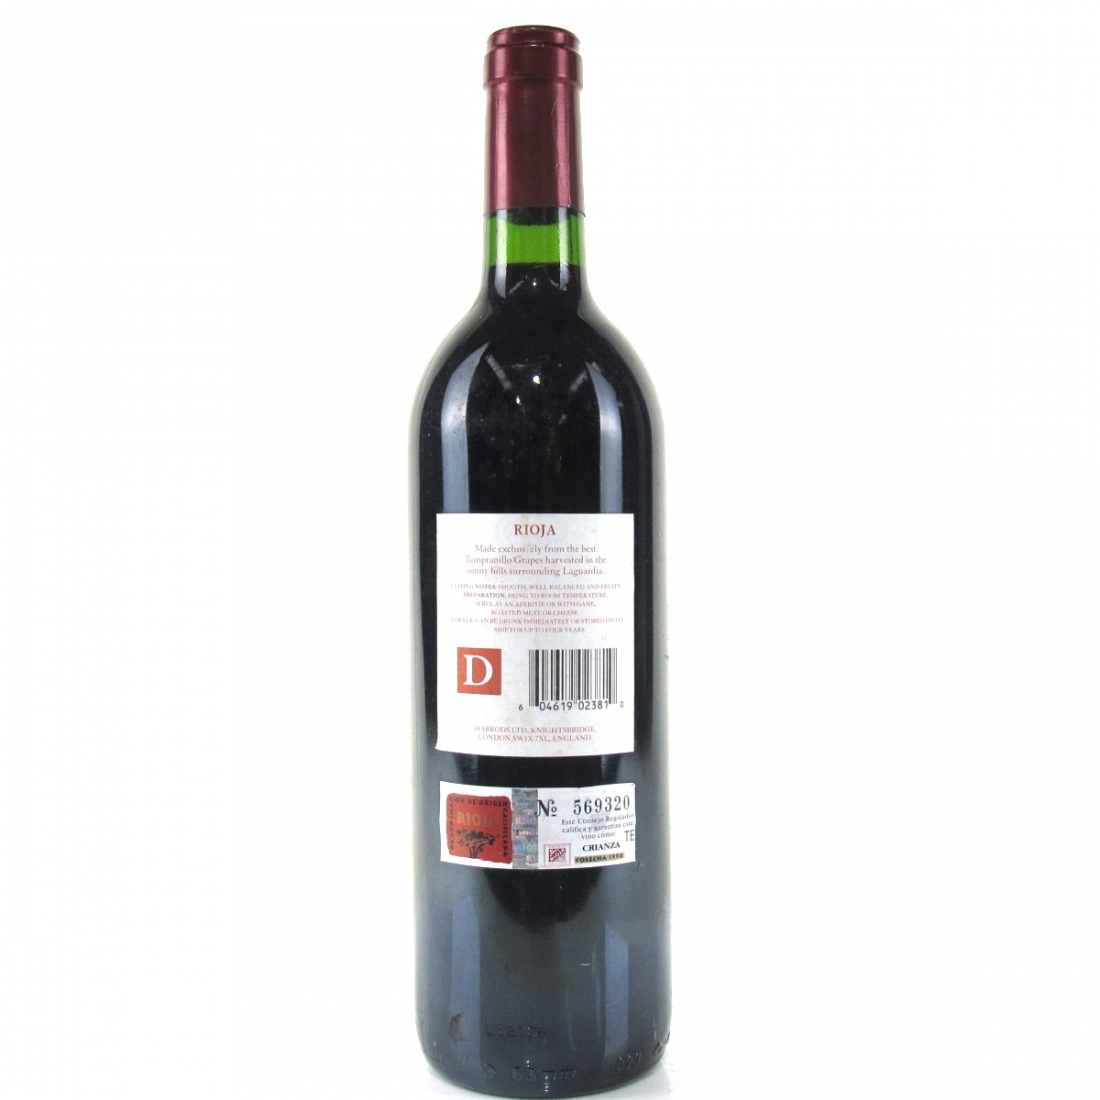 Bodegas Palacio 1998 Rioja Crianza / Harrods